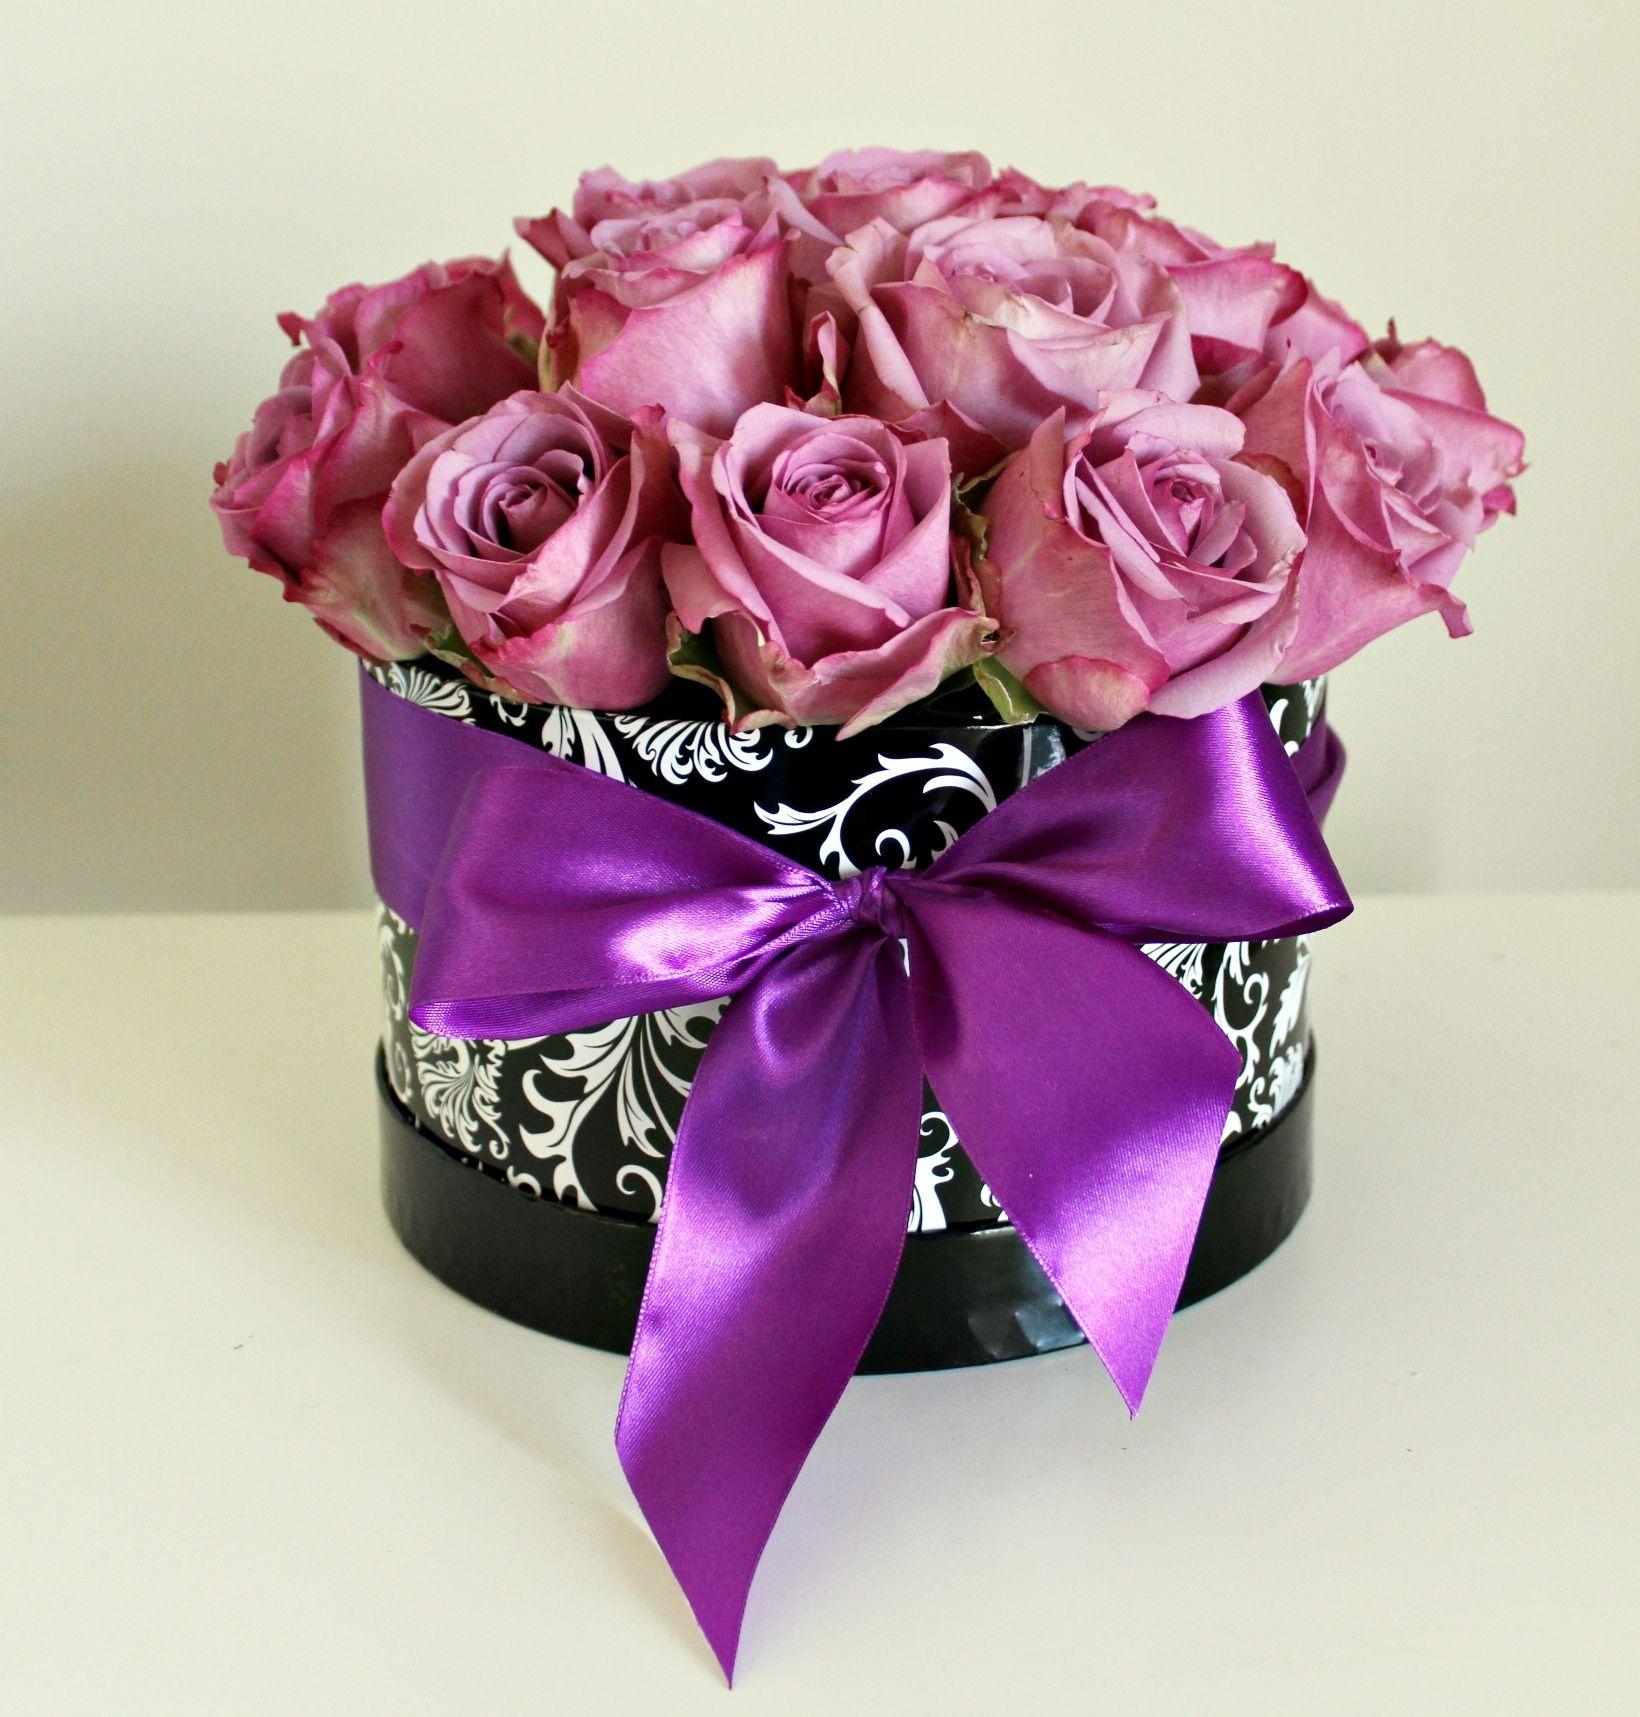 Luxury flowers in a box Chicago flowers Luxury flowers